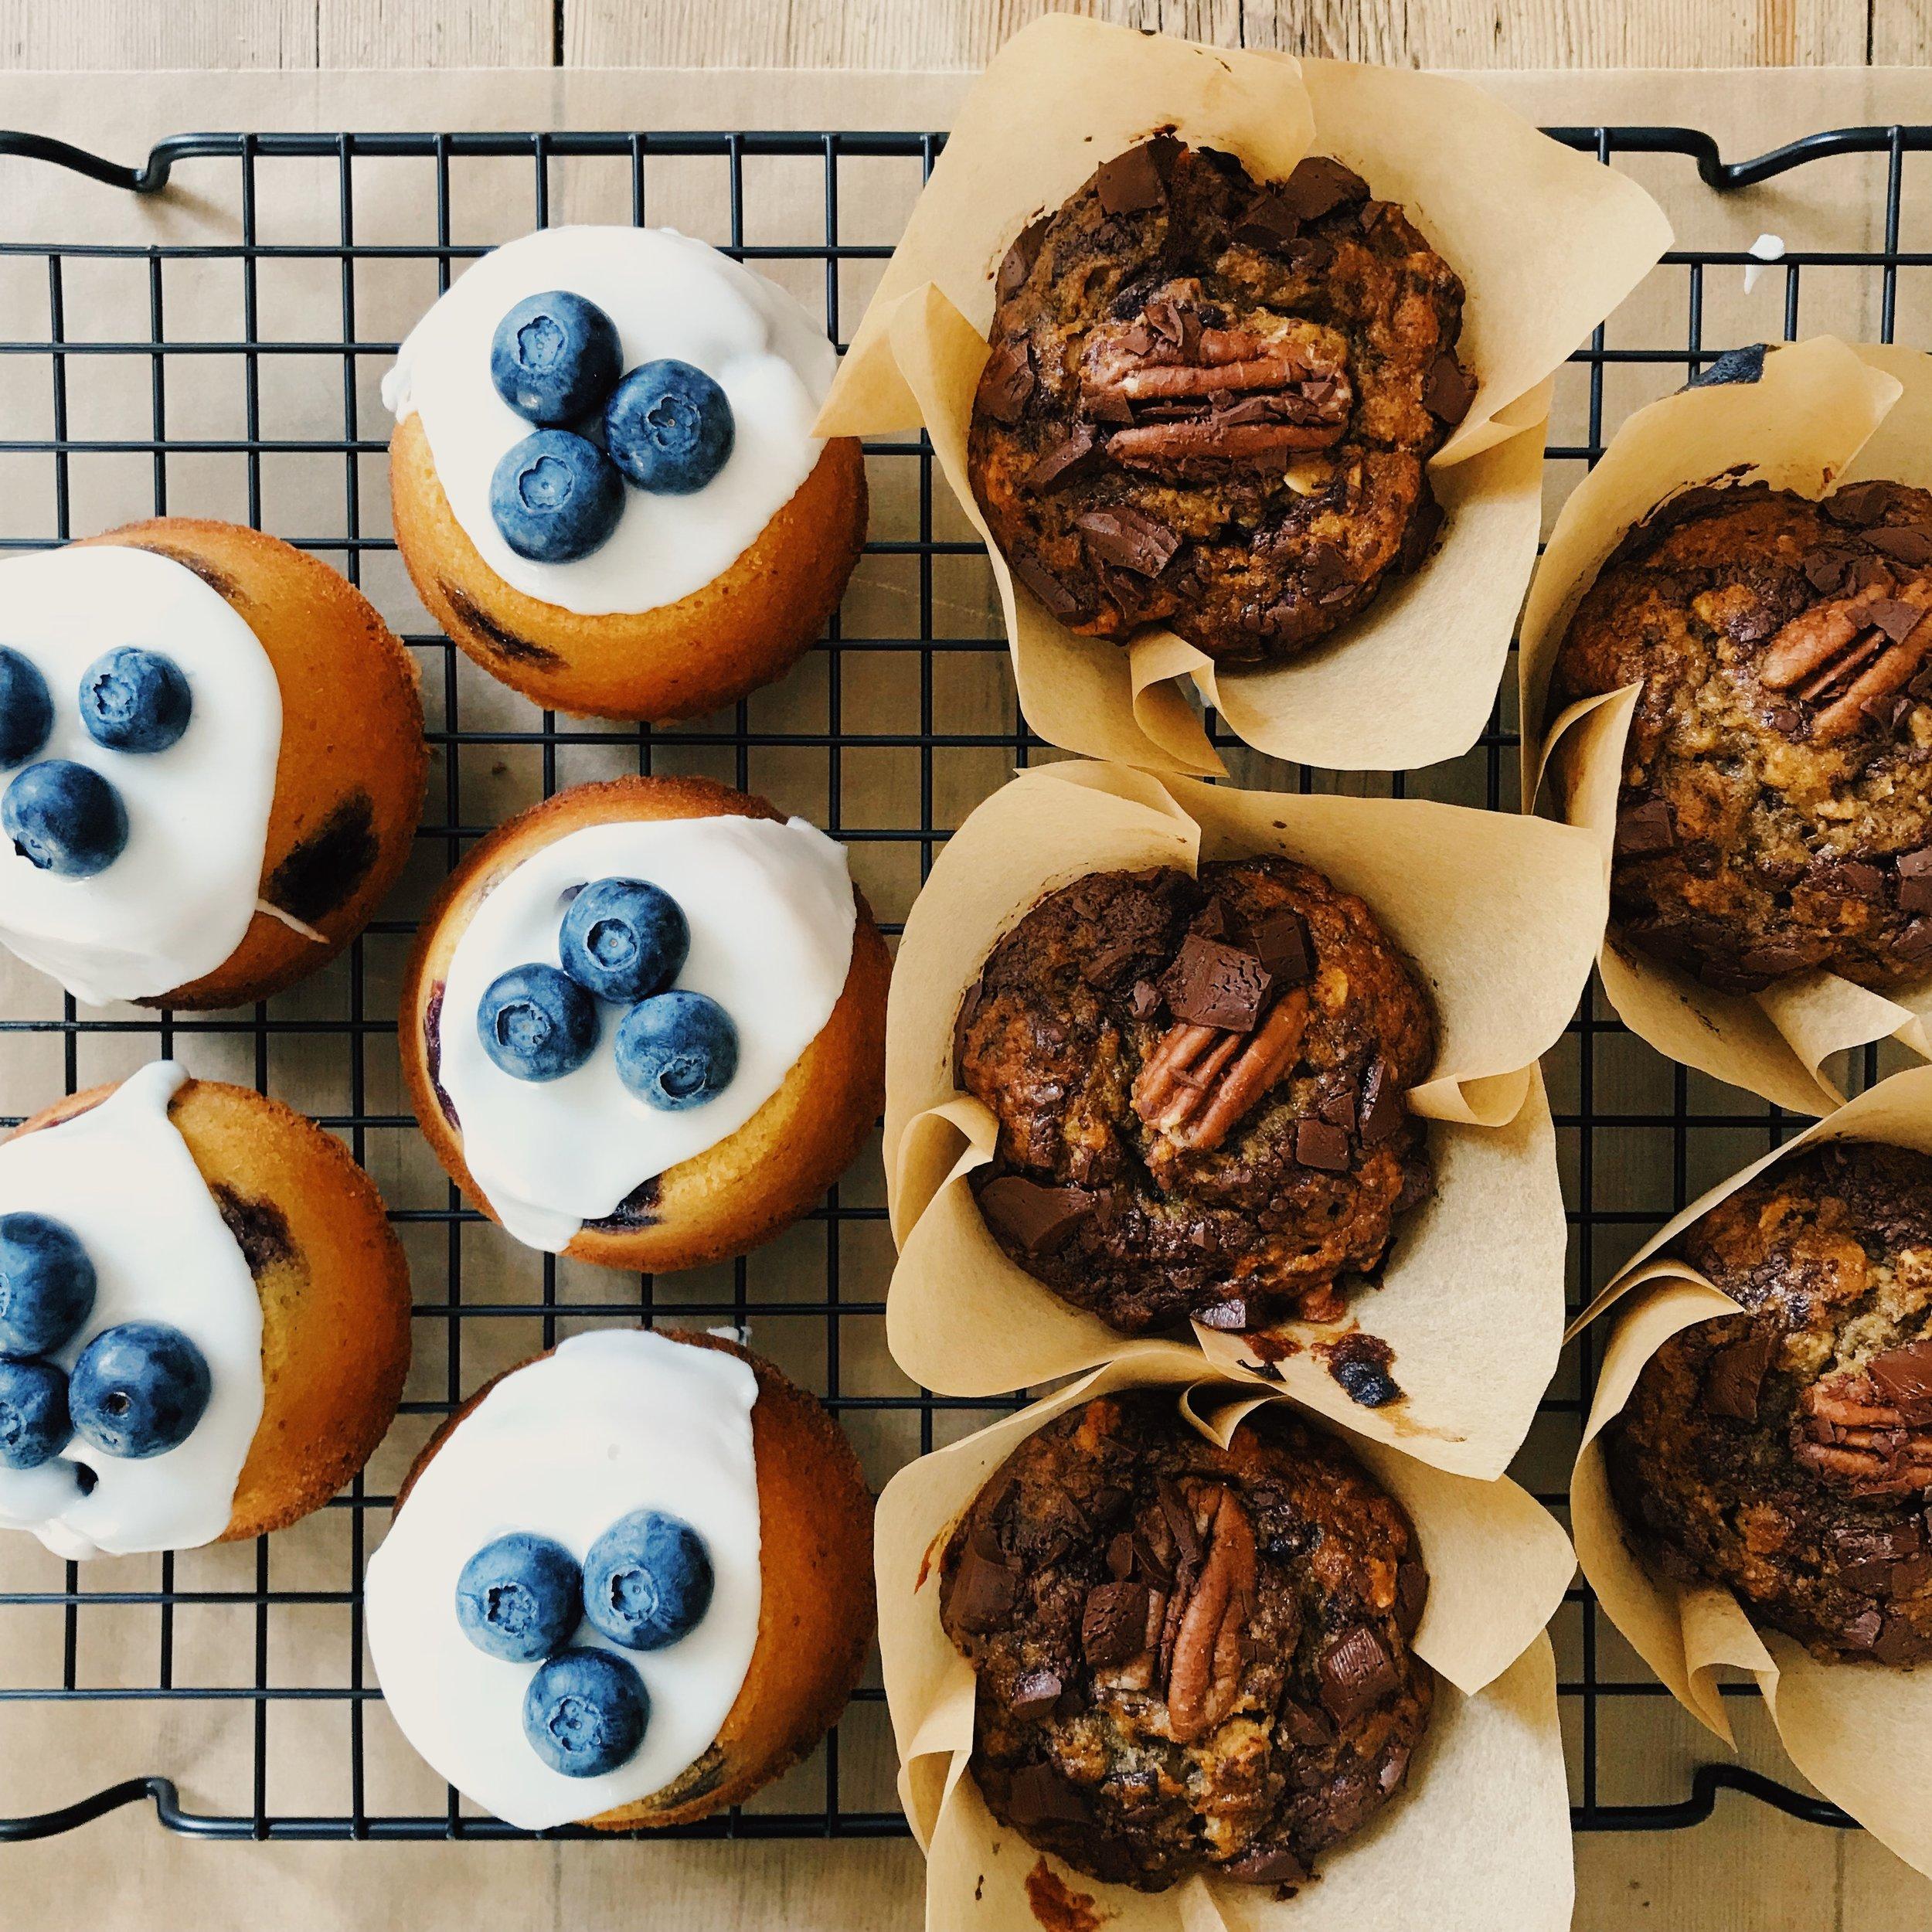 Lemon Blueberry Tea Cake and Banana Chocolate Muffin